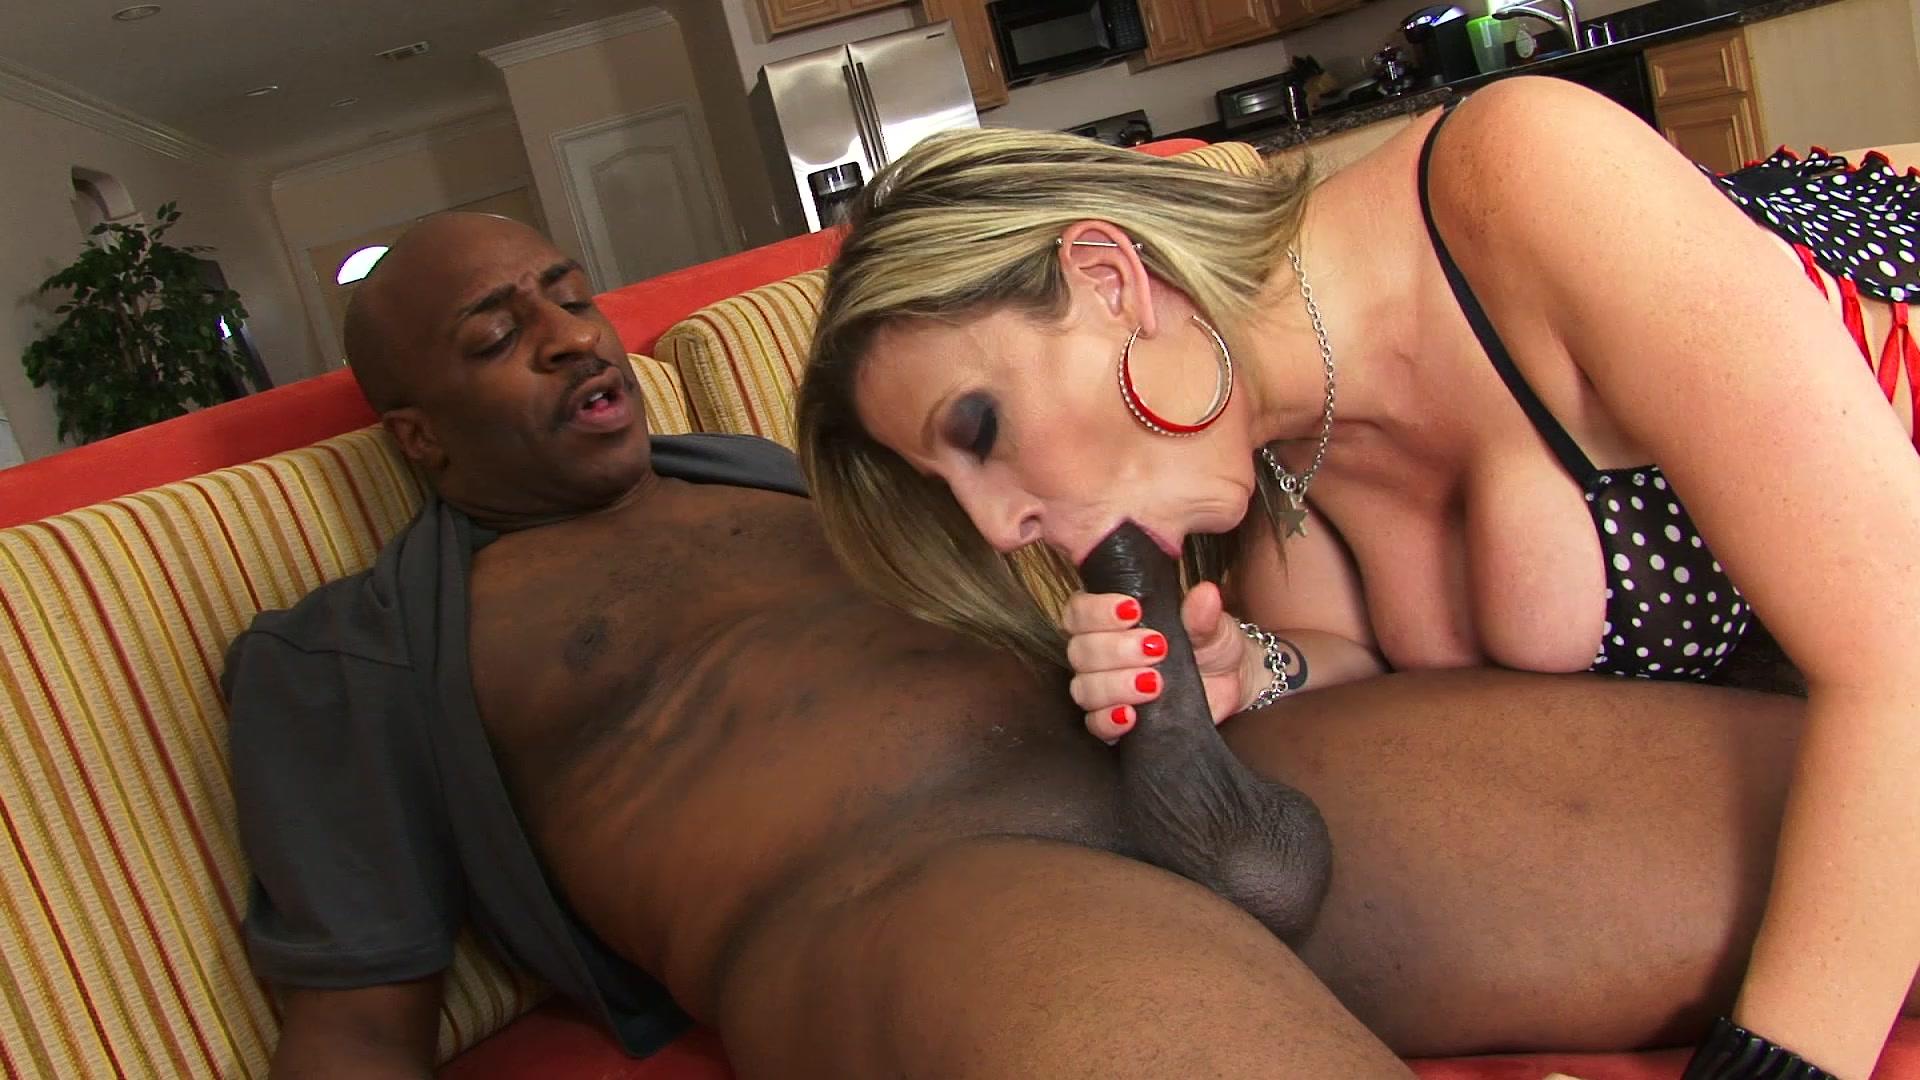 Robyn truelove's porn pics